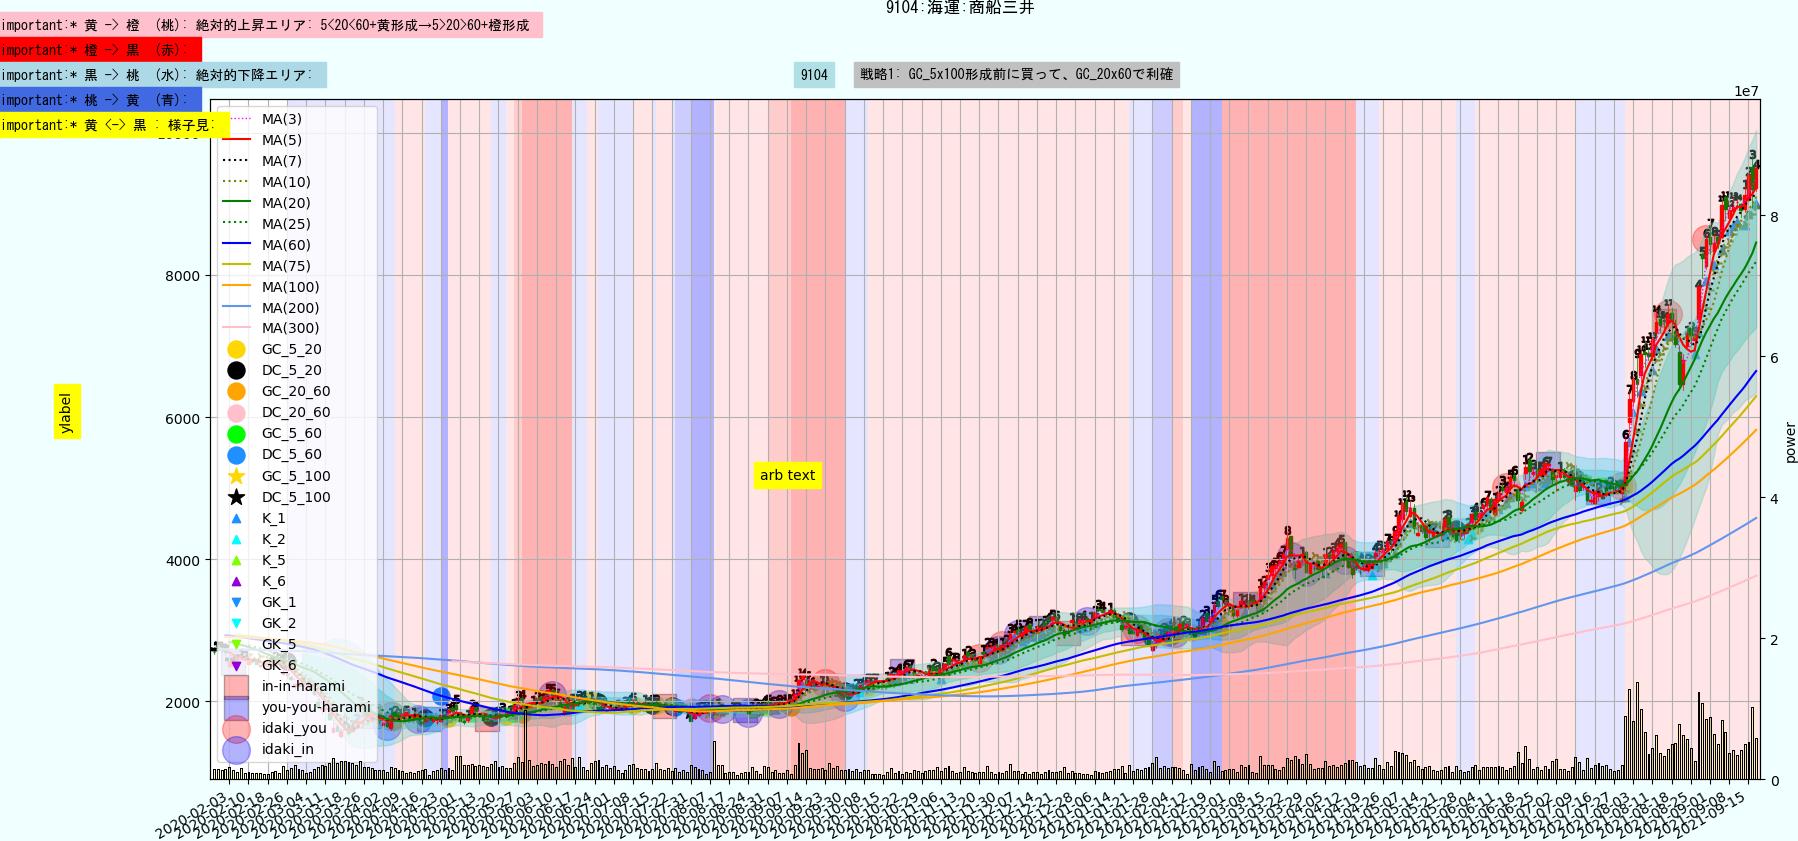 https://trident-capital-strage.s3.ap-northeast-1.amazonaws.com/charts/20210917/9104.png